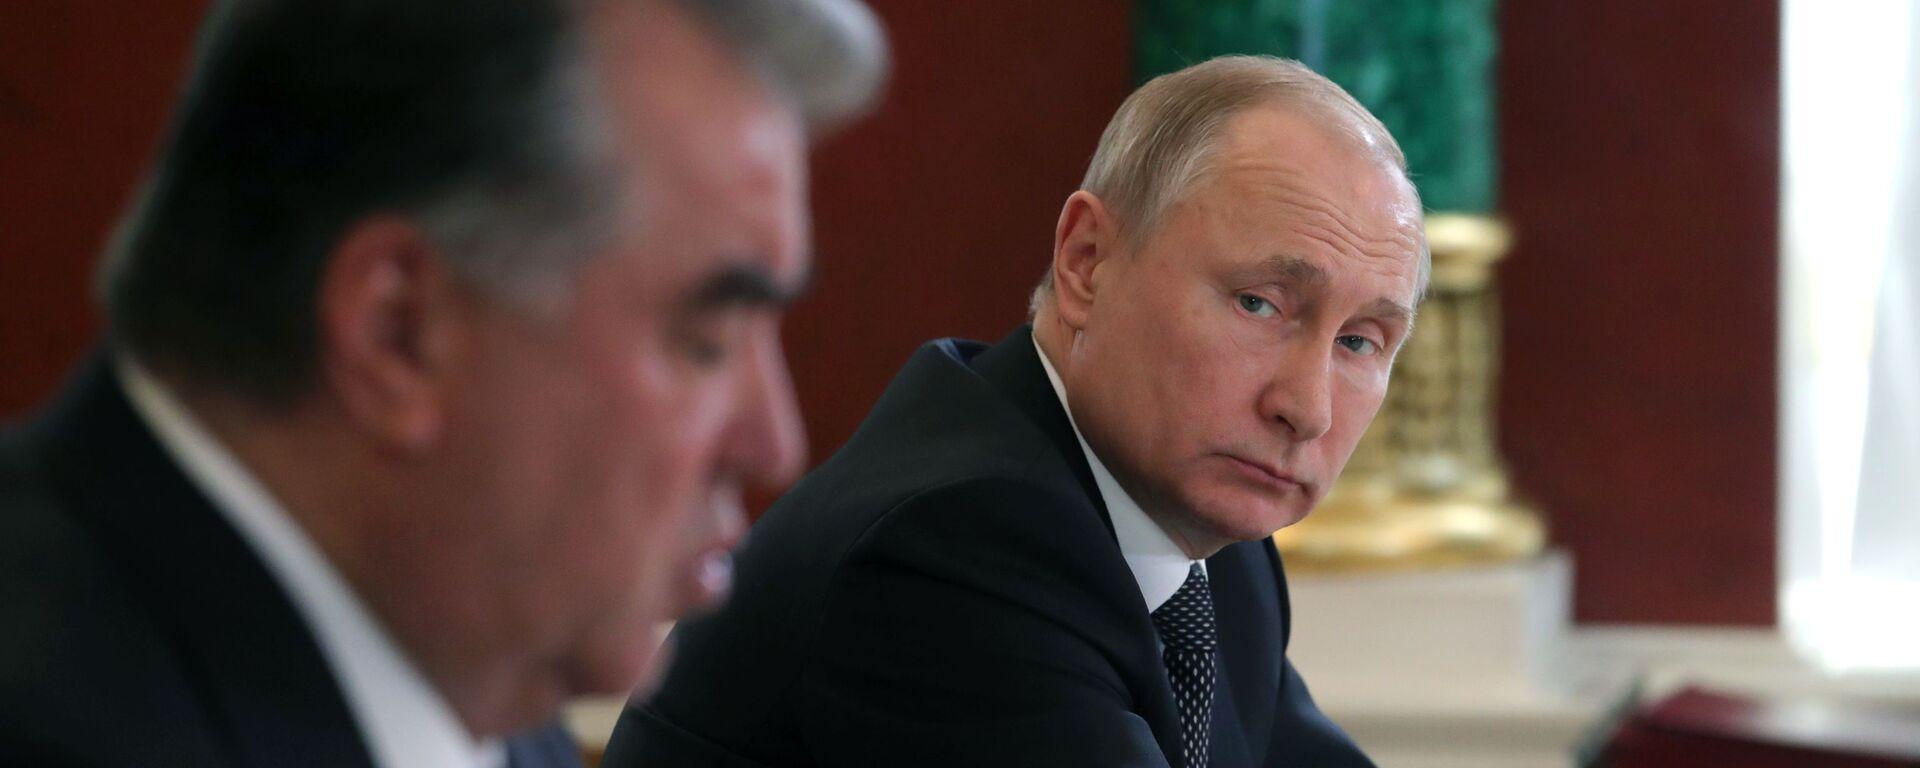 Президент РФ В. Путин встретился с президентом Таджикистана Э. Рахмон - Sputnik Таджикистан, 1920, 05.07.2021